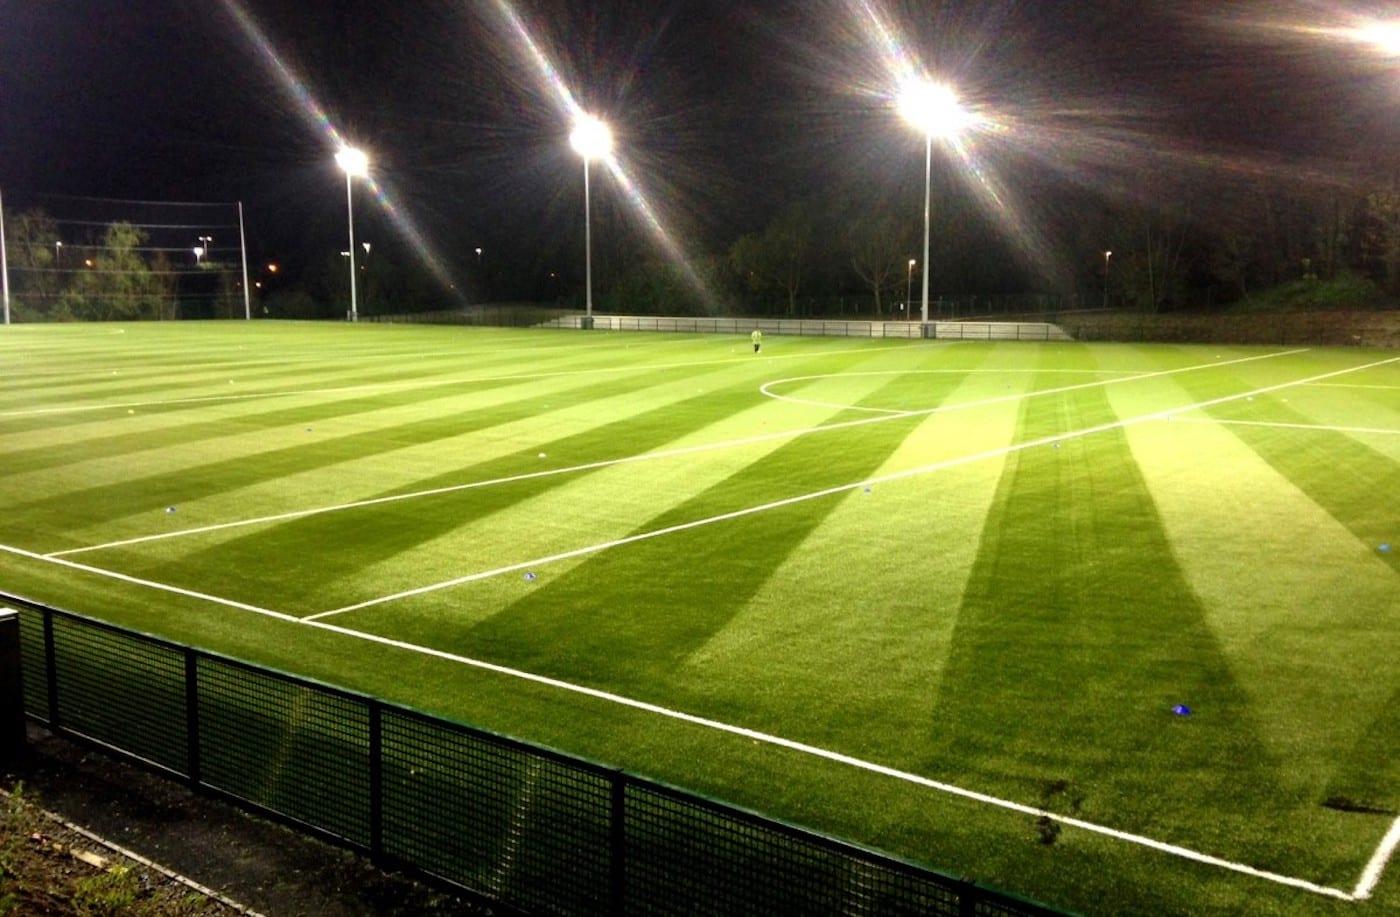 18cc1811a29e7 Armagh GAA unveil plans for multi-million pound training facility - Armagh I